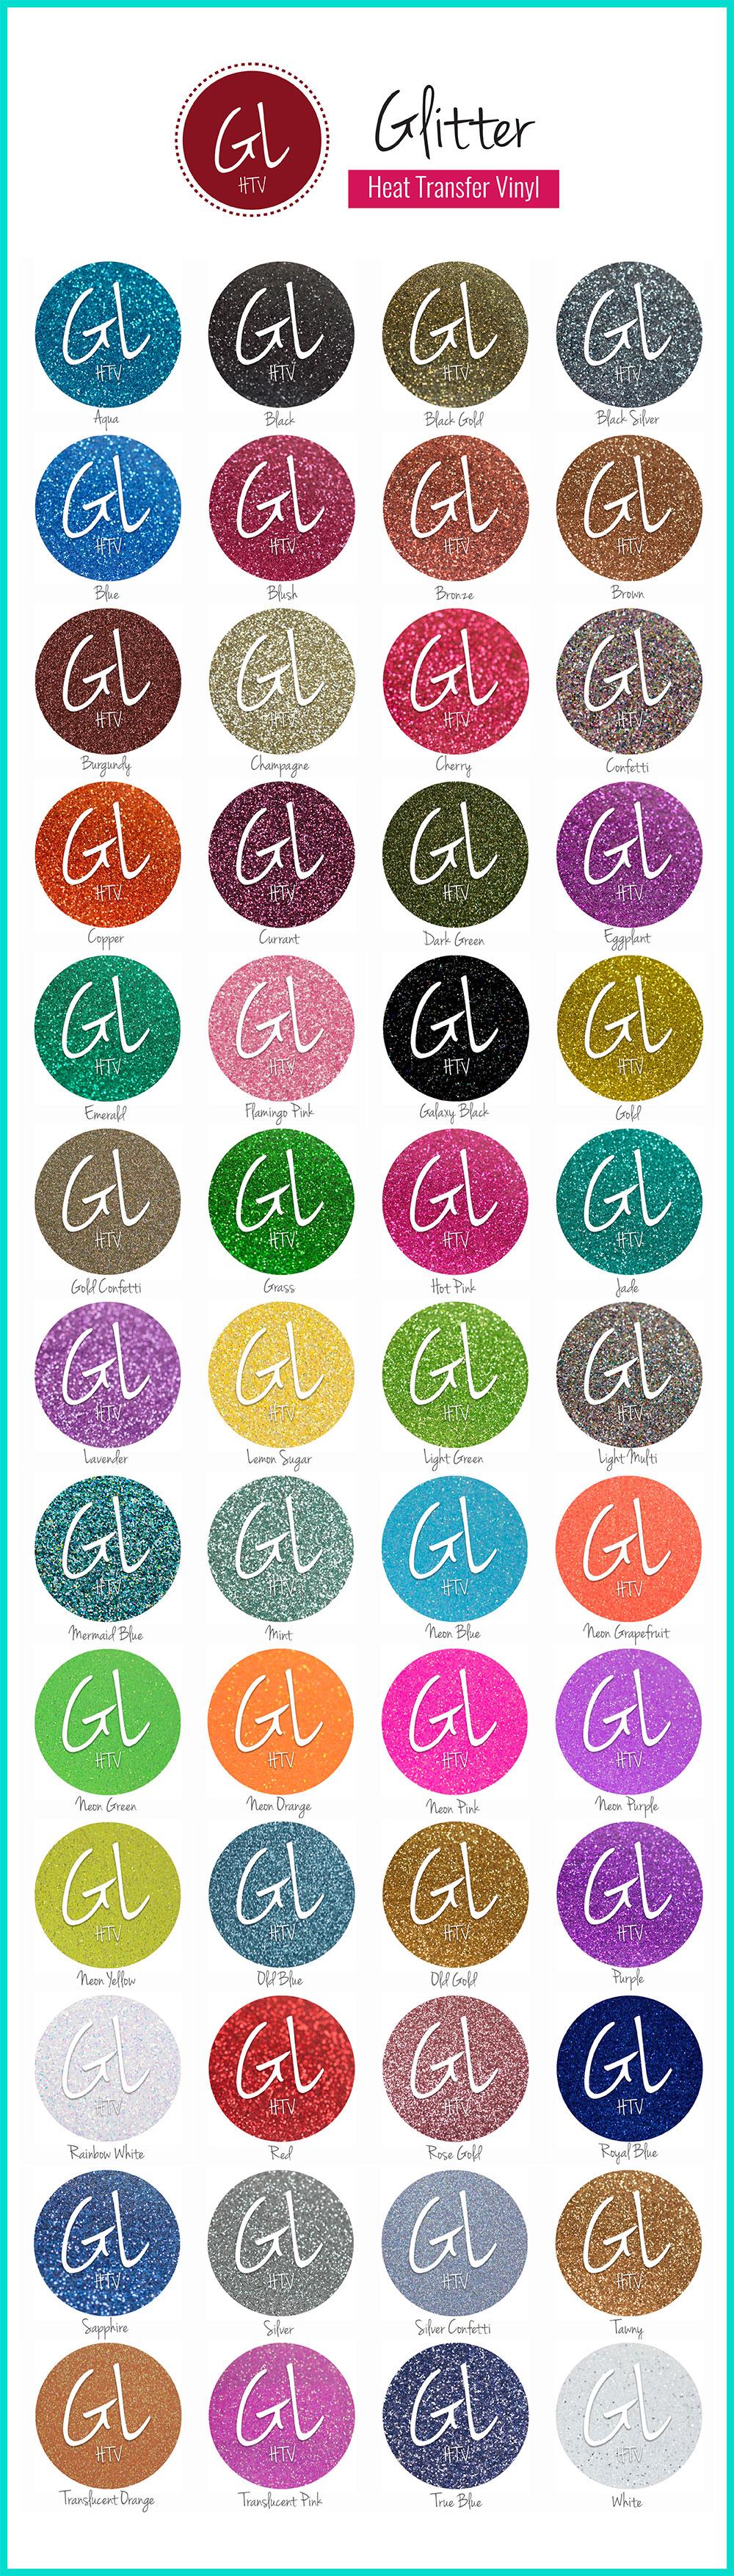 glhtv-updated-color-chart-03-03-20.jpg